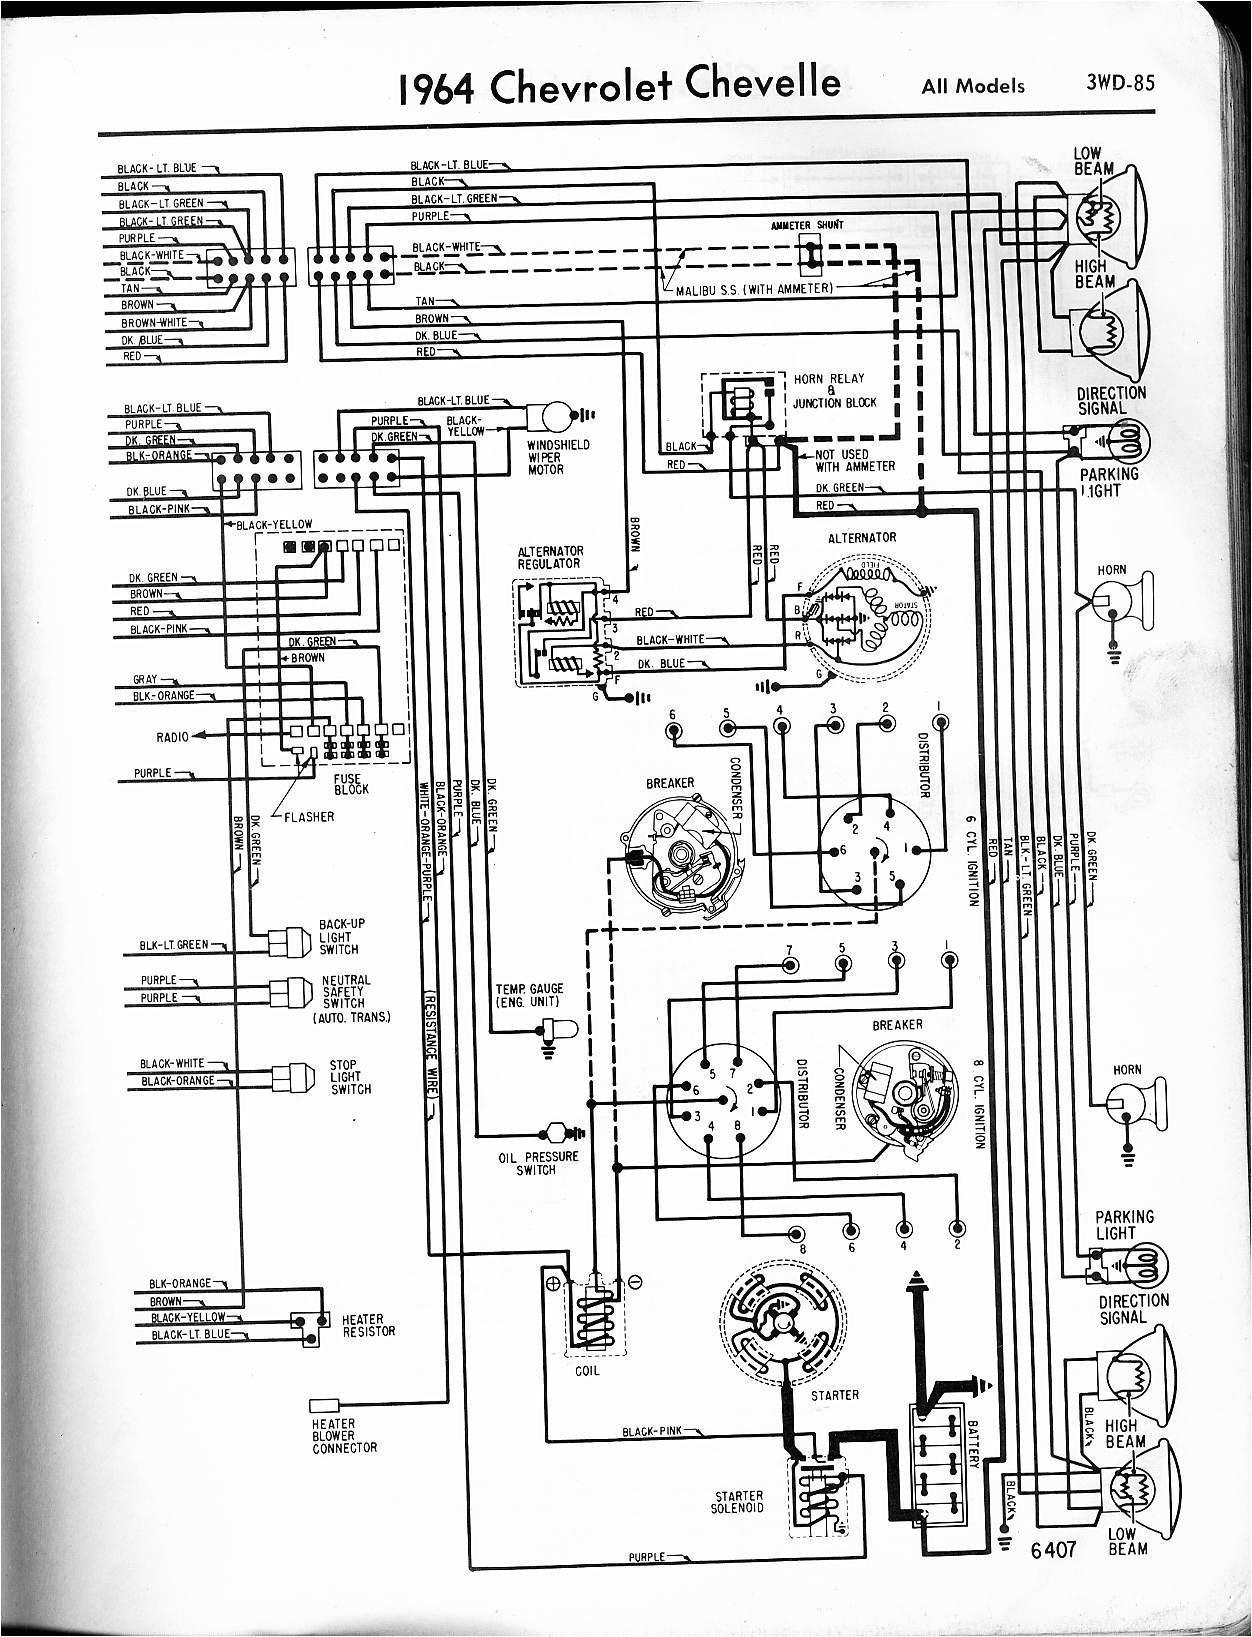 1968 chevelle wiring diagram chevelle ss dash wiring diagram get free image about wiring diagram of 1968 chevelle wiring diagram jpg